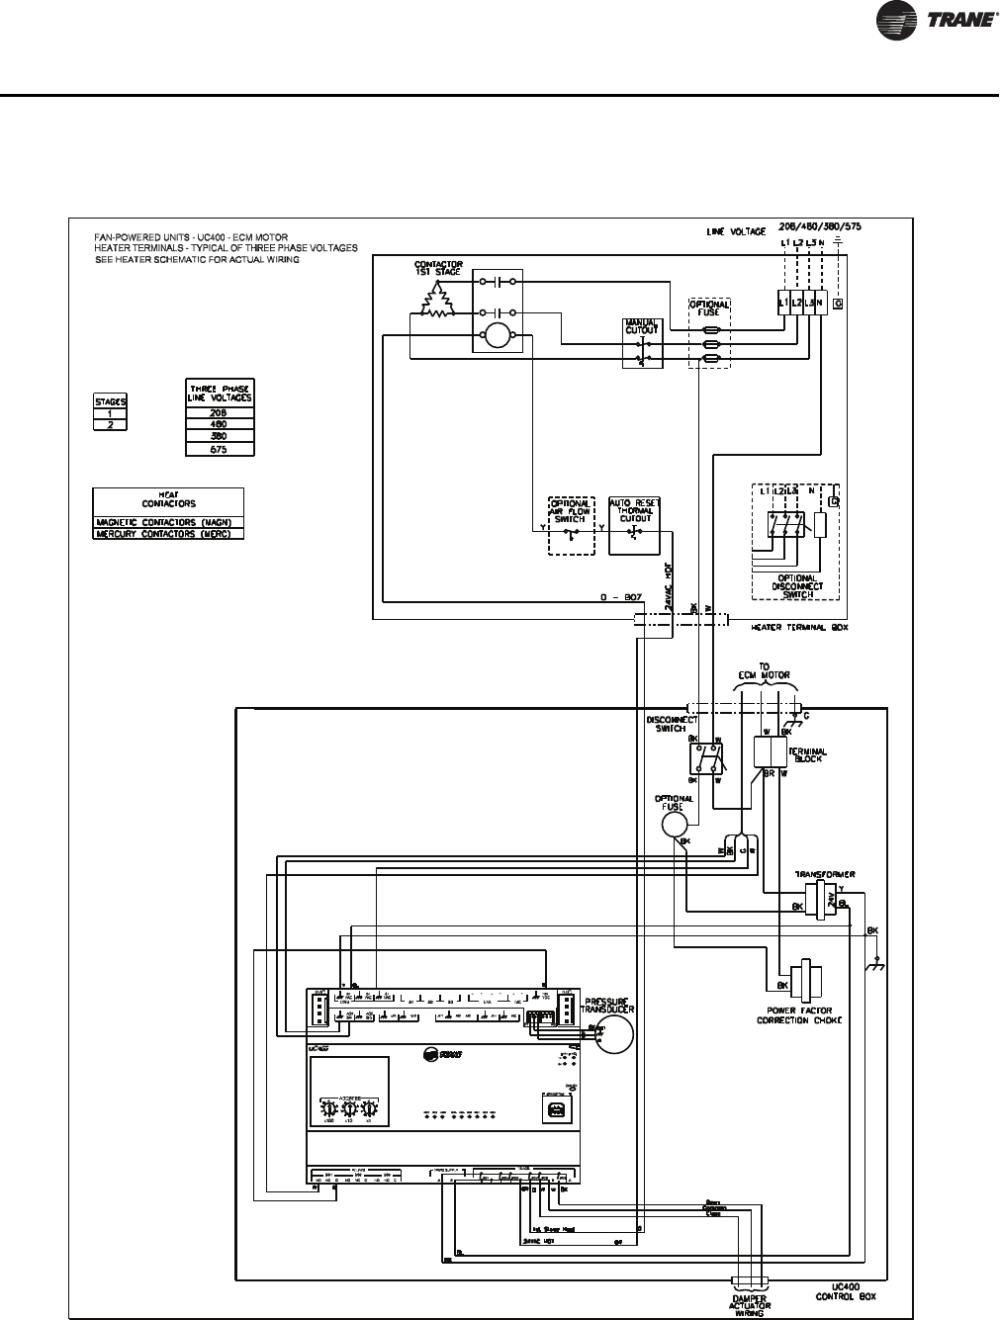 medium resolution of trane round in out installation and maintenance manual vav svx07a envav svx07a en 93 wiring diagrams